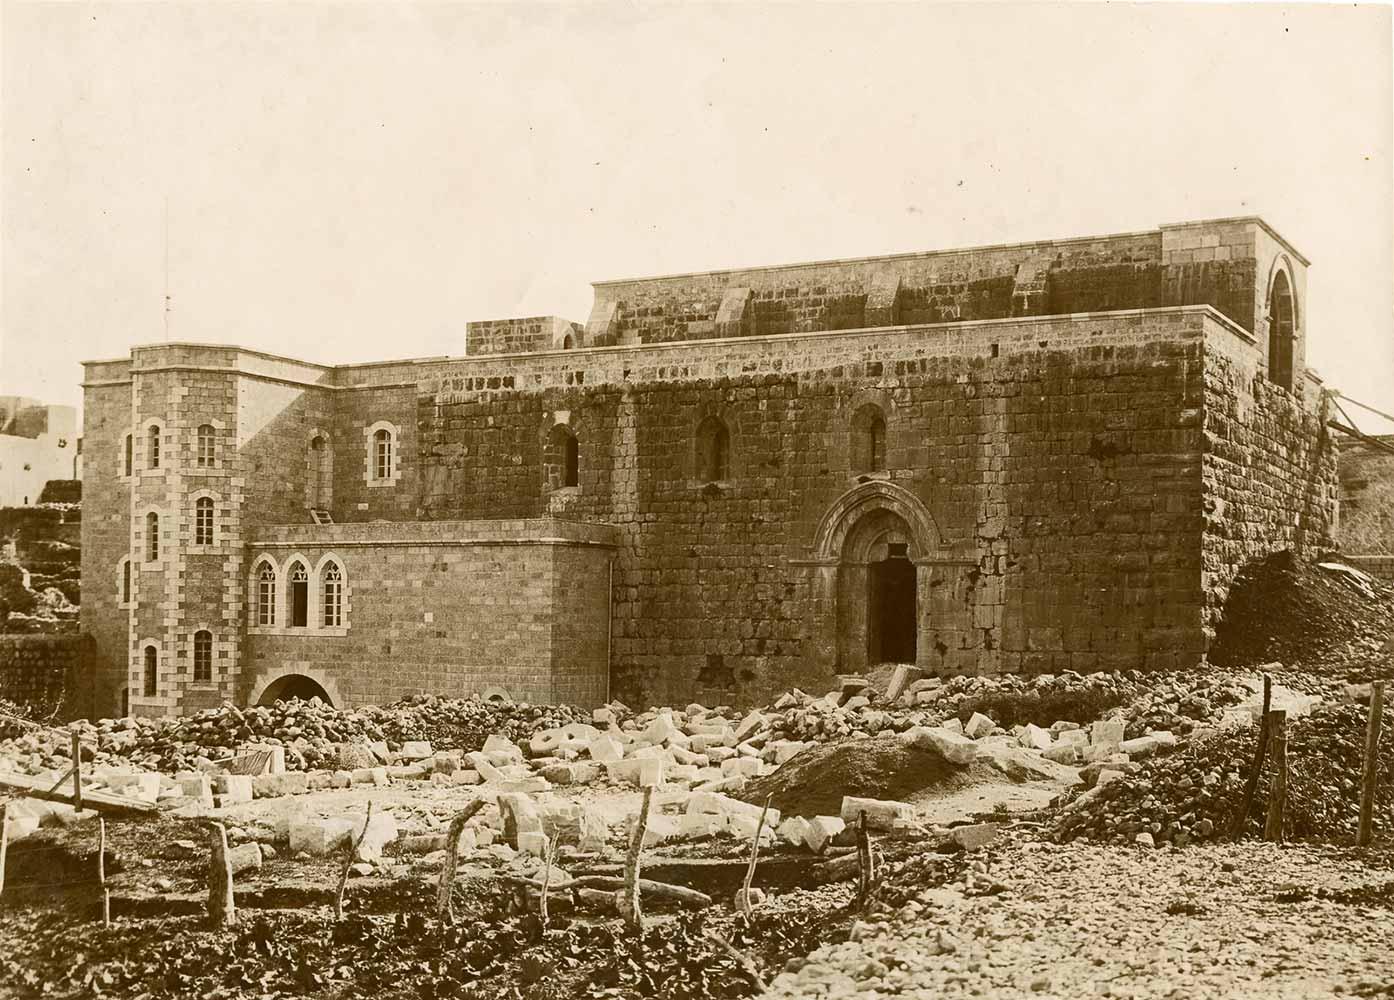 monastere-abu-gosh-1903